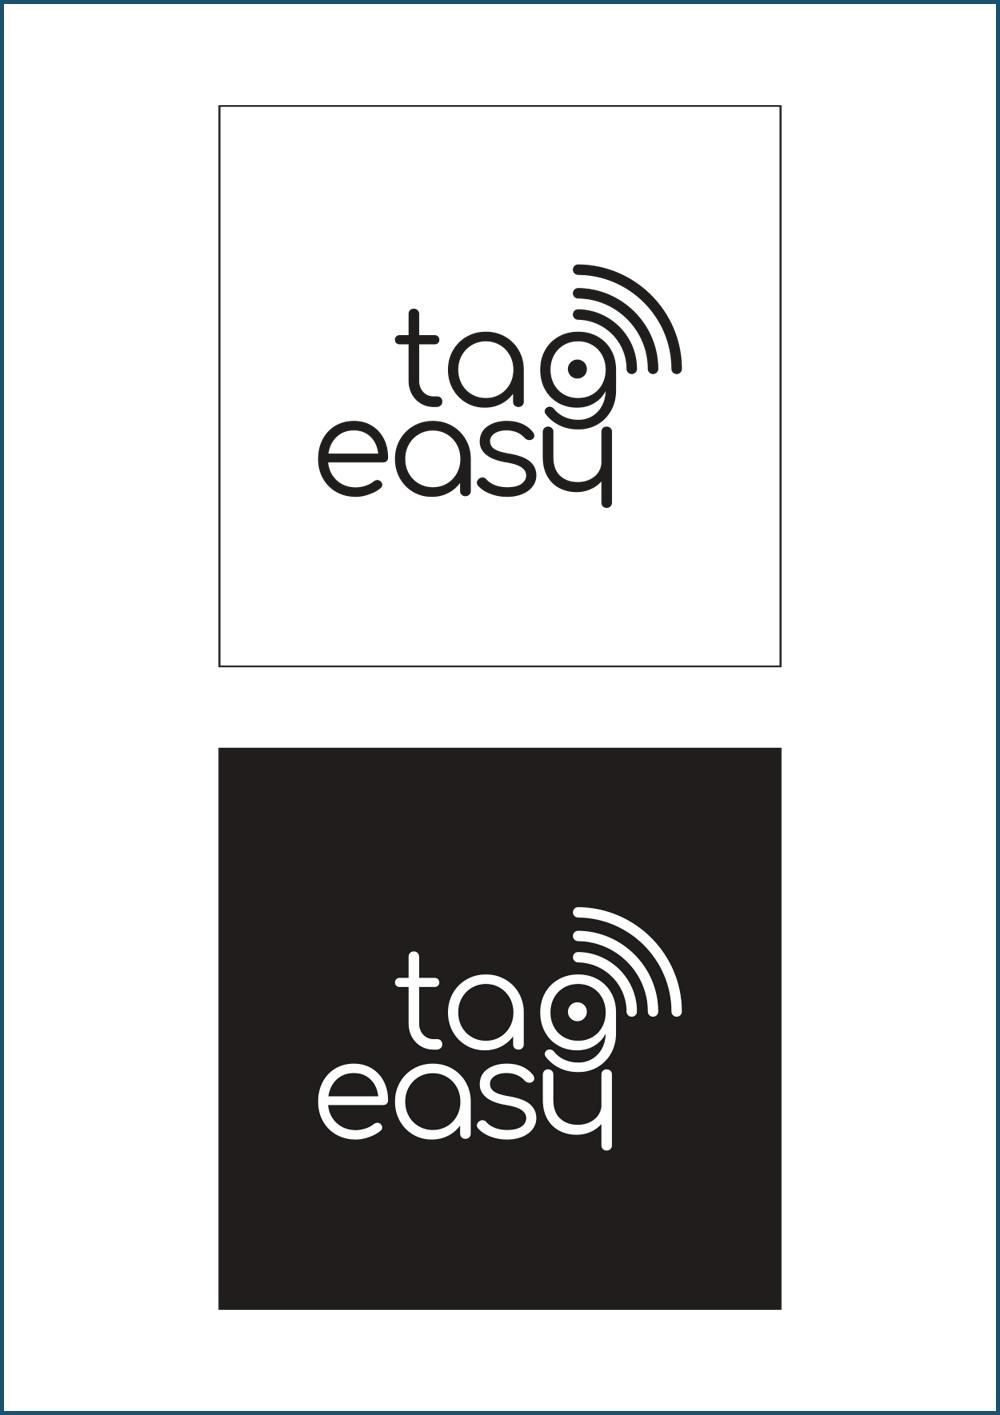 Logo Tag Easy. Manuale: negativo, poisitivo